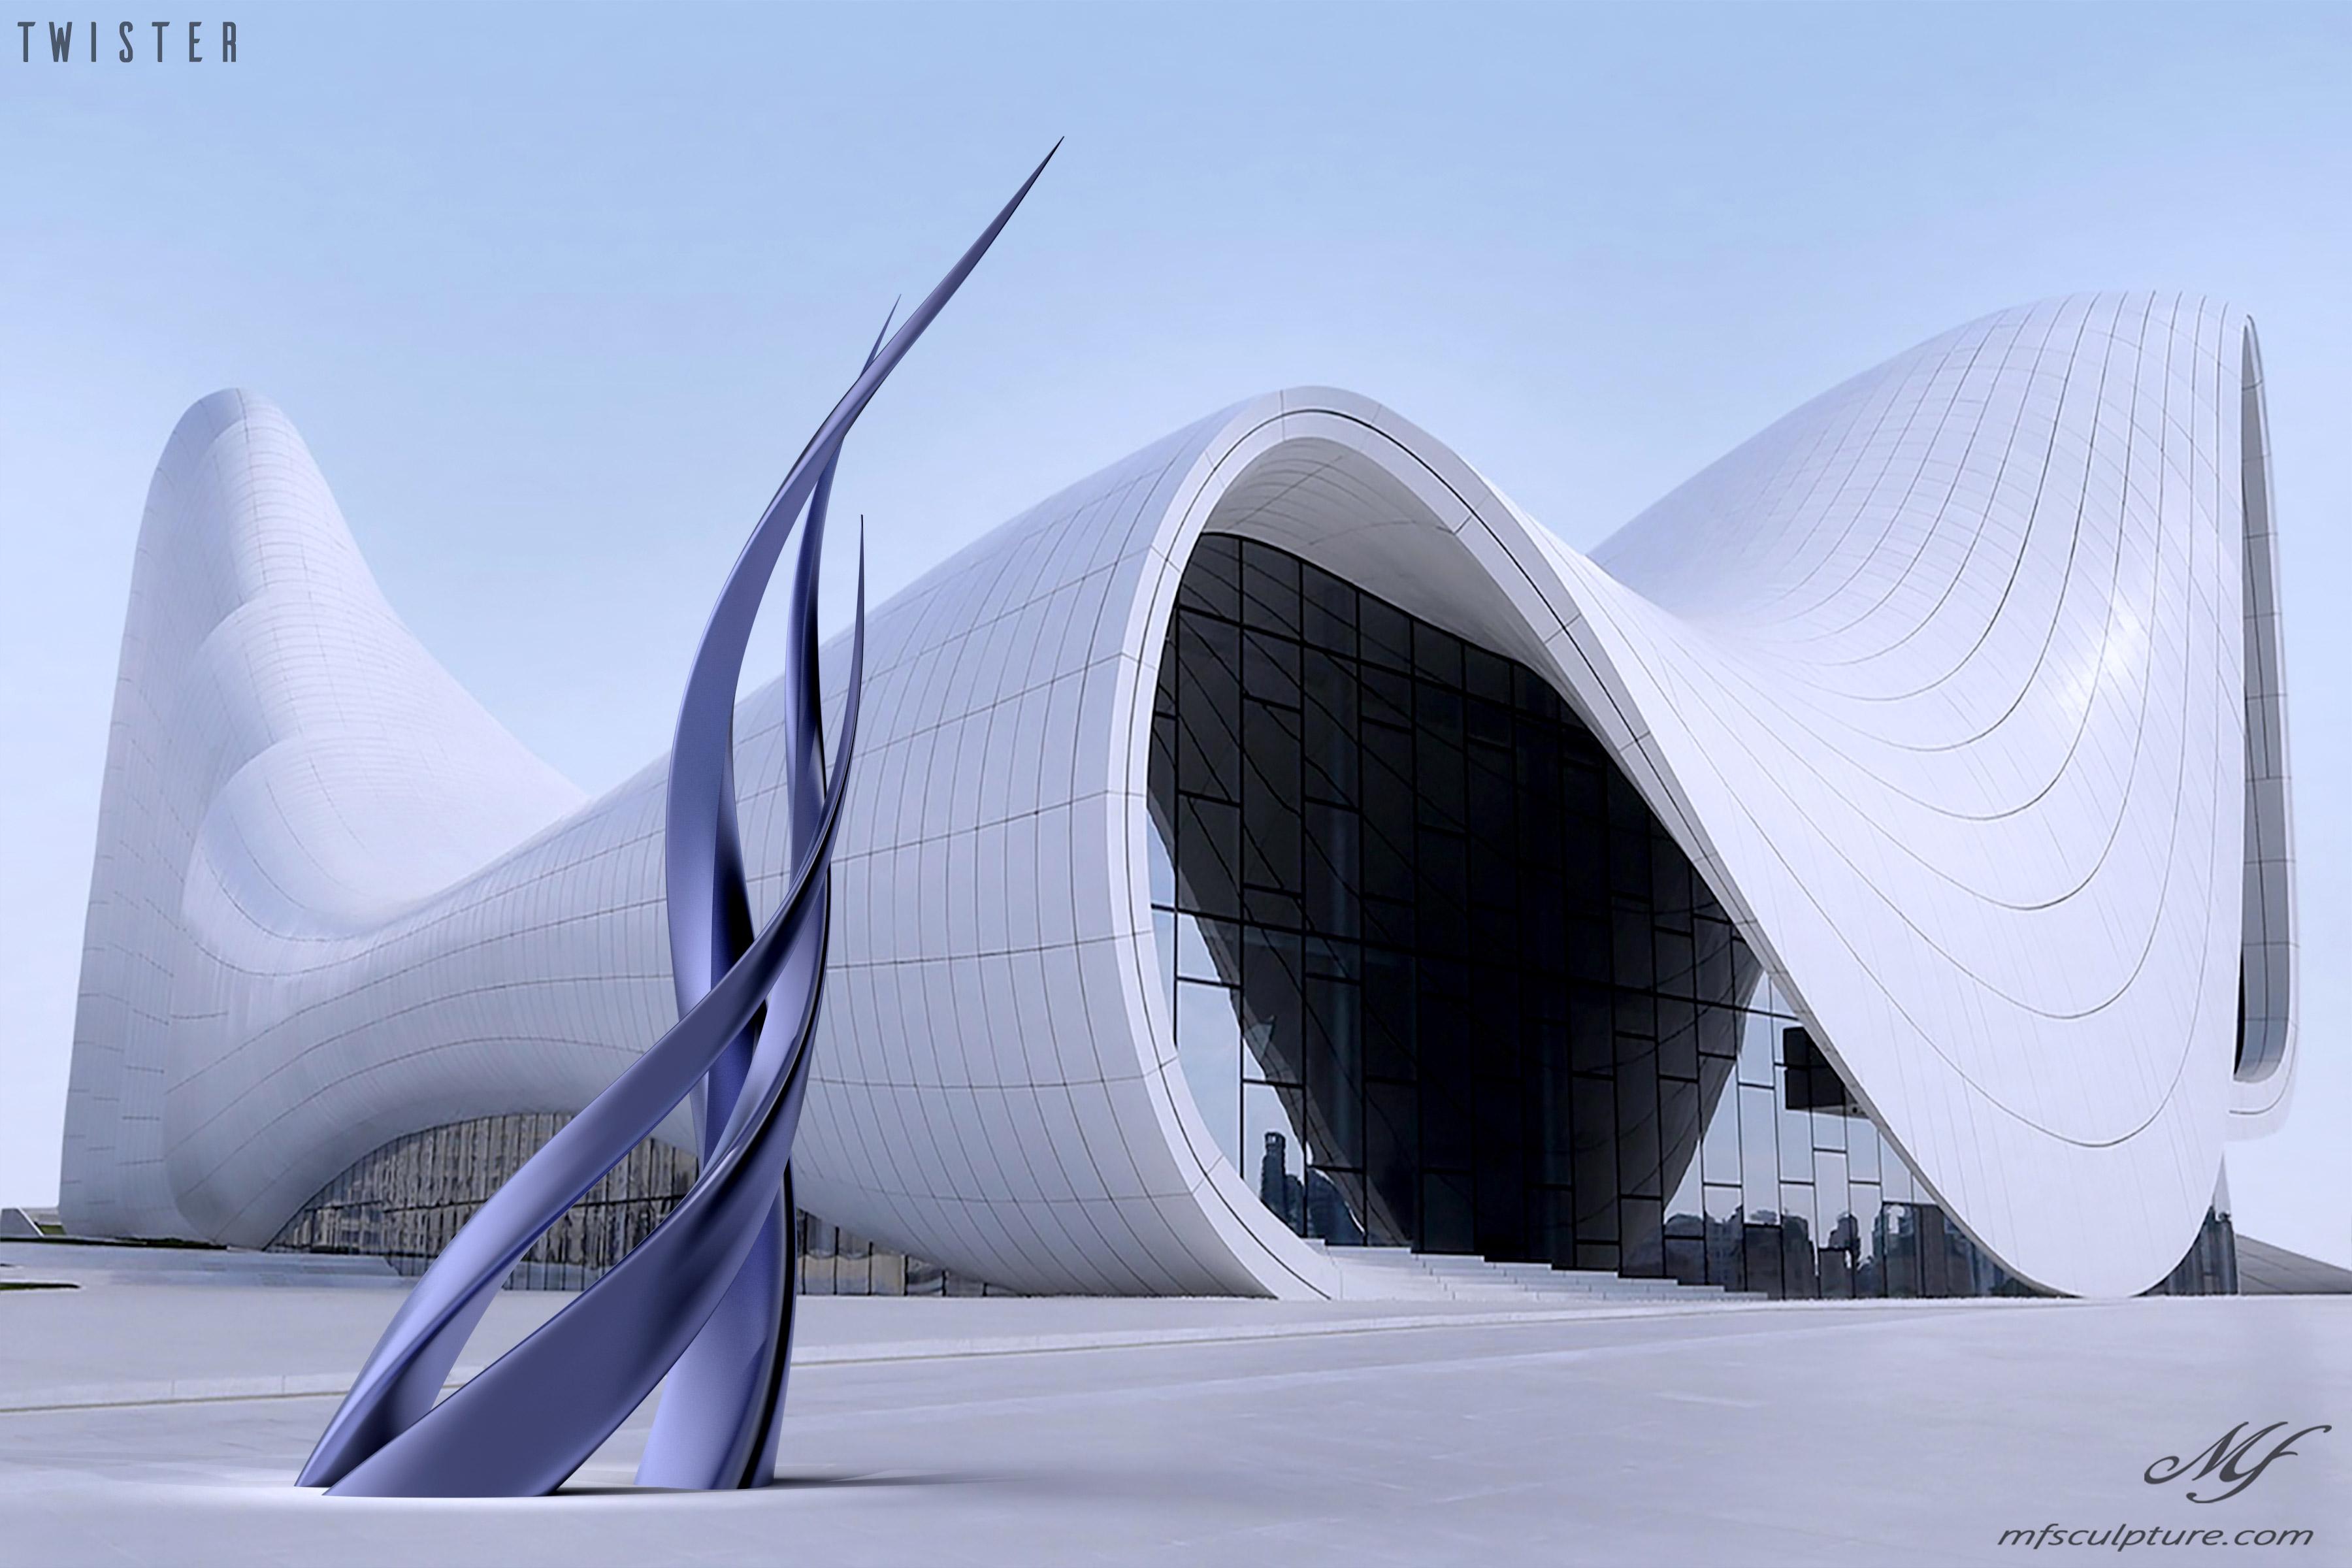 Heydar Aliyev Zaha Hadid Modern Sculpture Public Art Twister 8